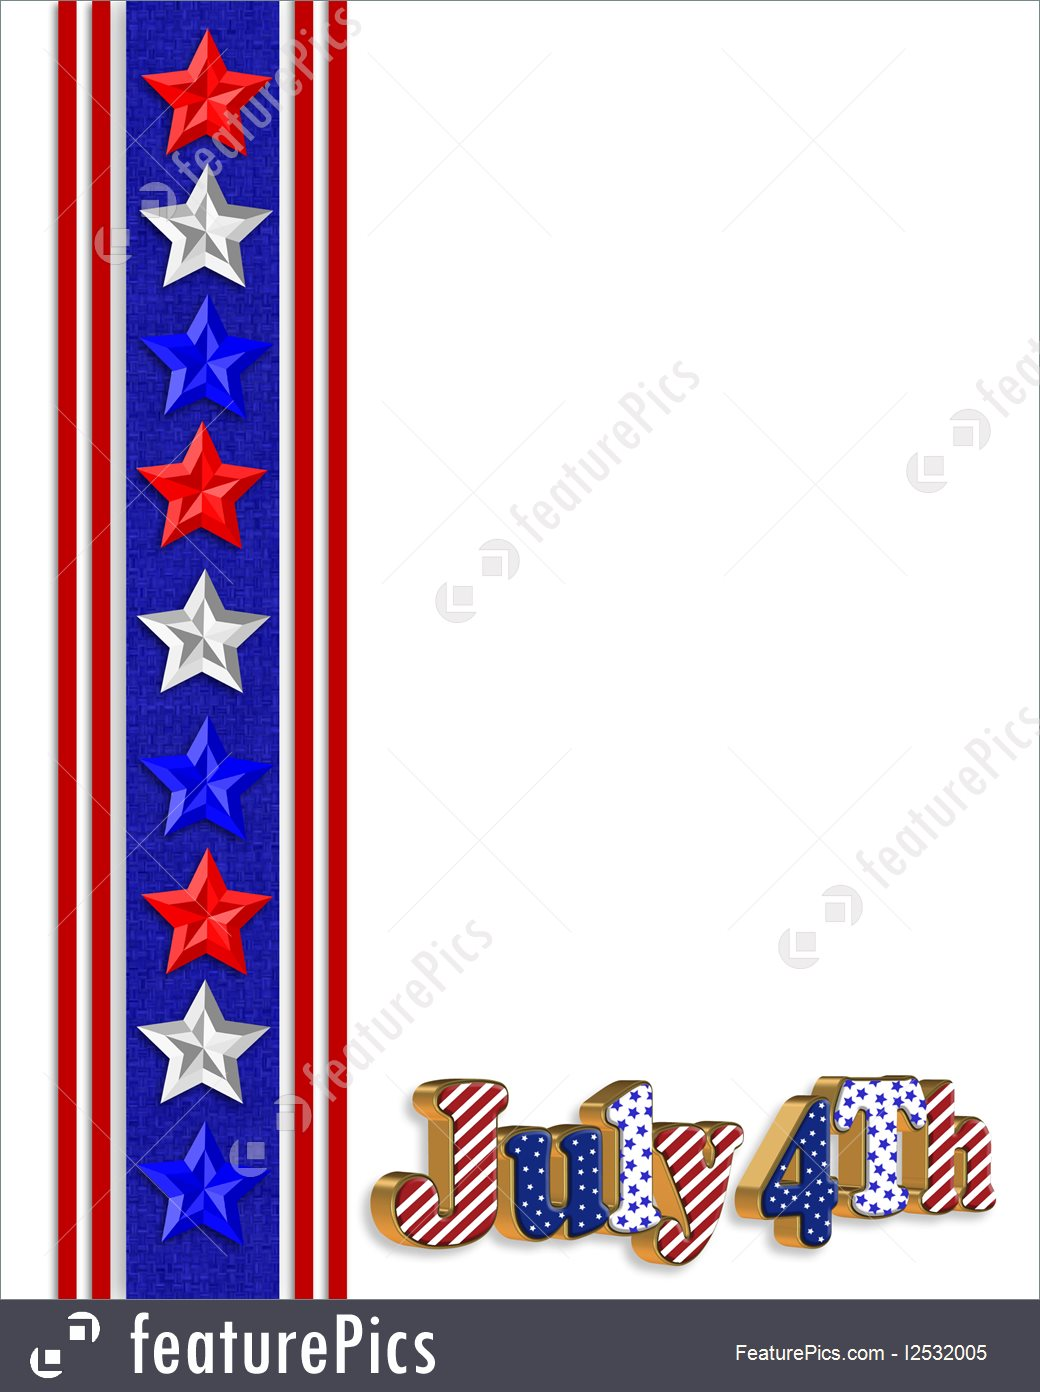 1040x1392 Illustration Of 4th Of July Patriotic Border